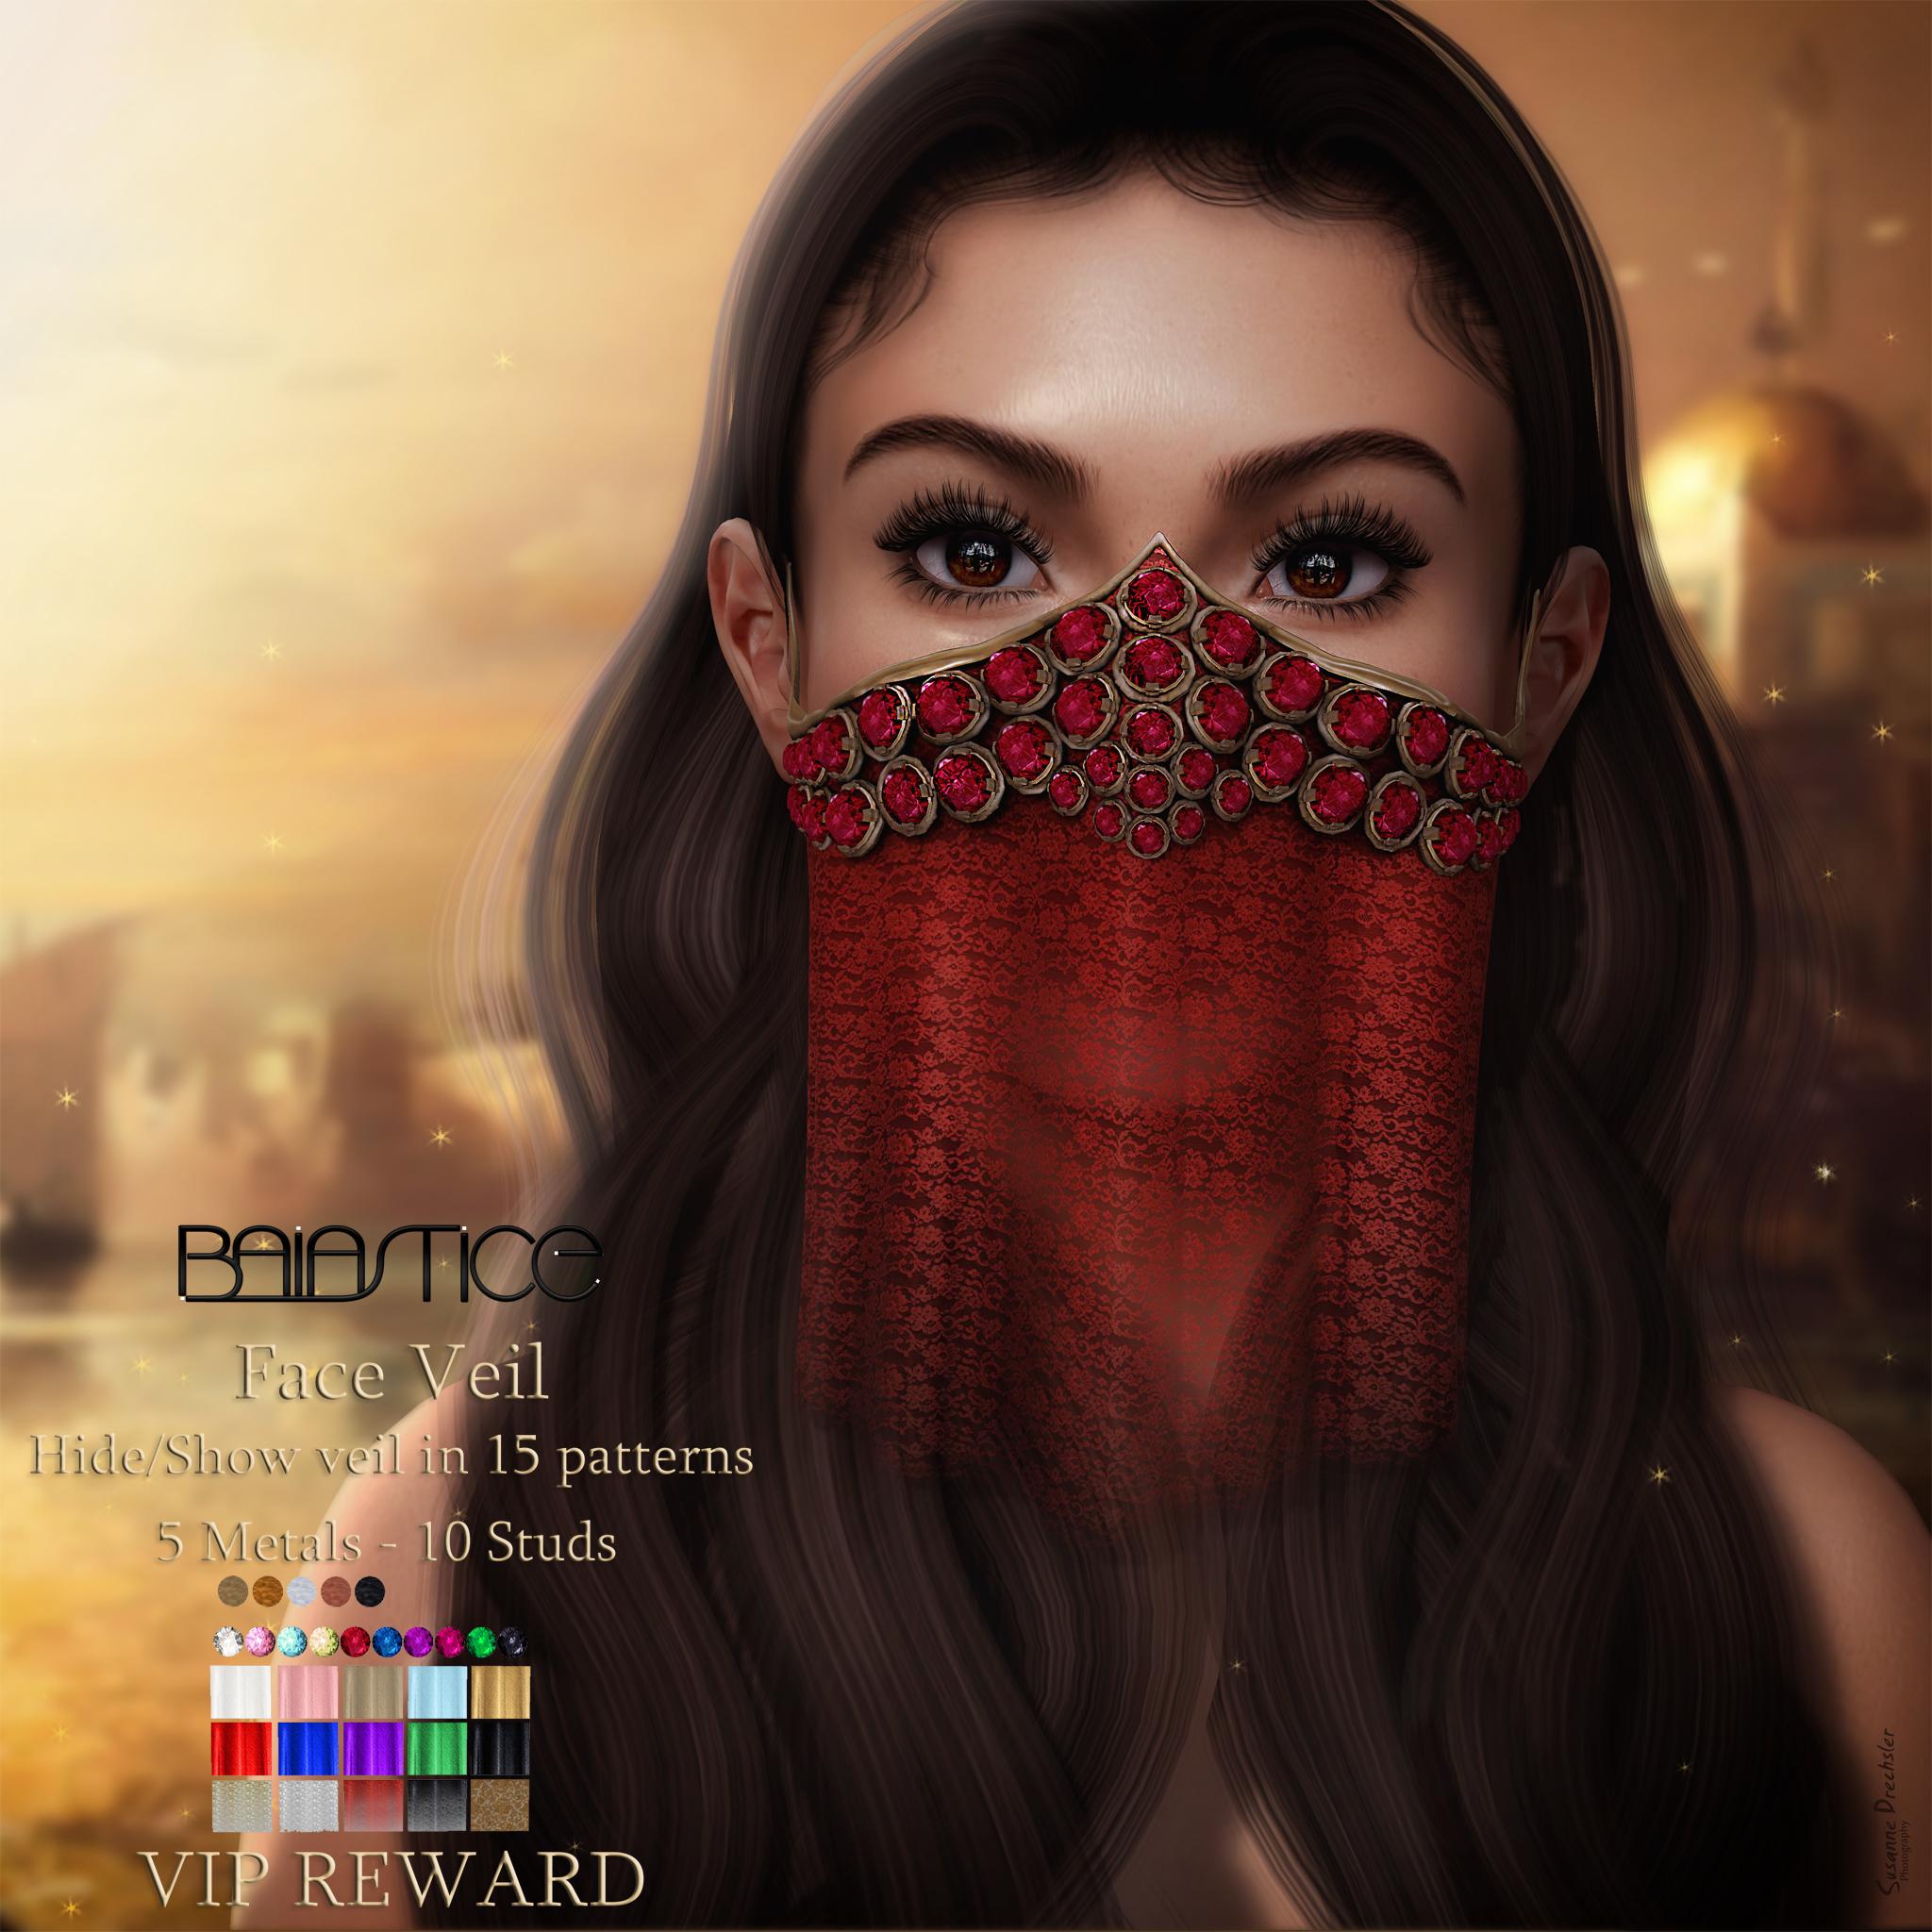 Baiastice_Casbah-Face Veil VIP REWARD.jpg